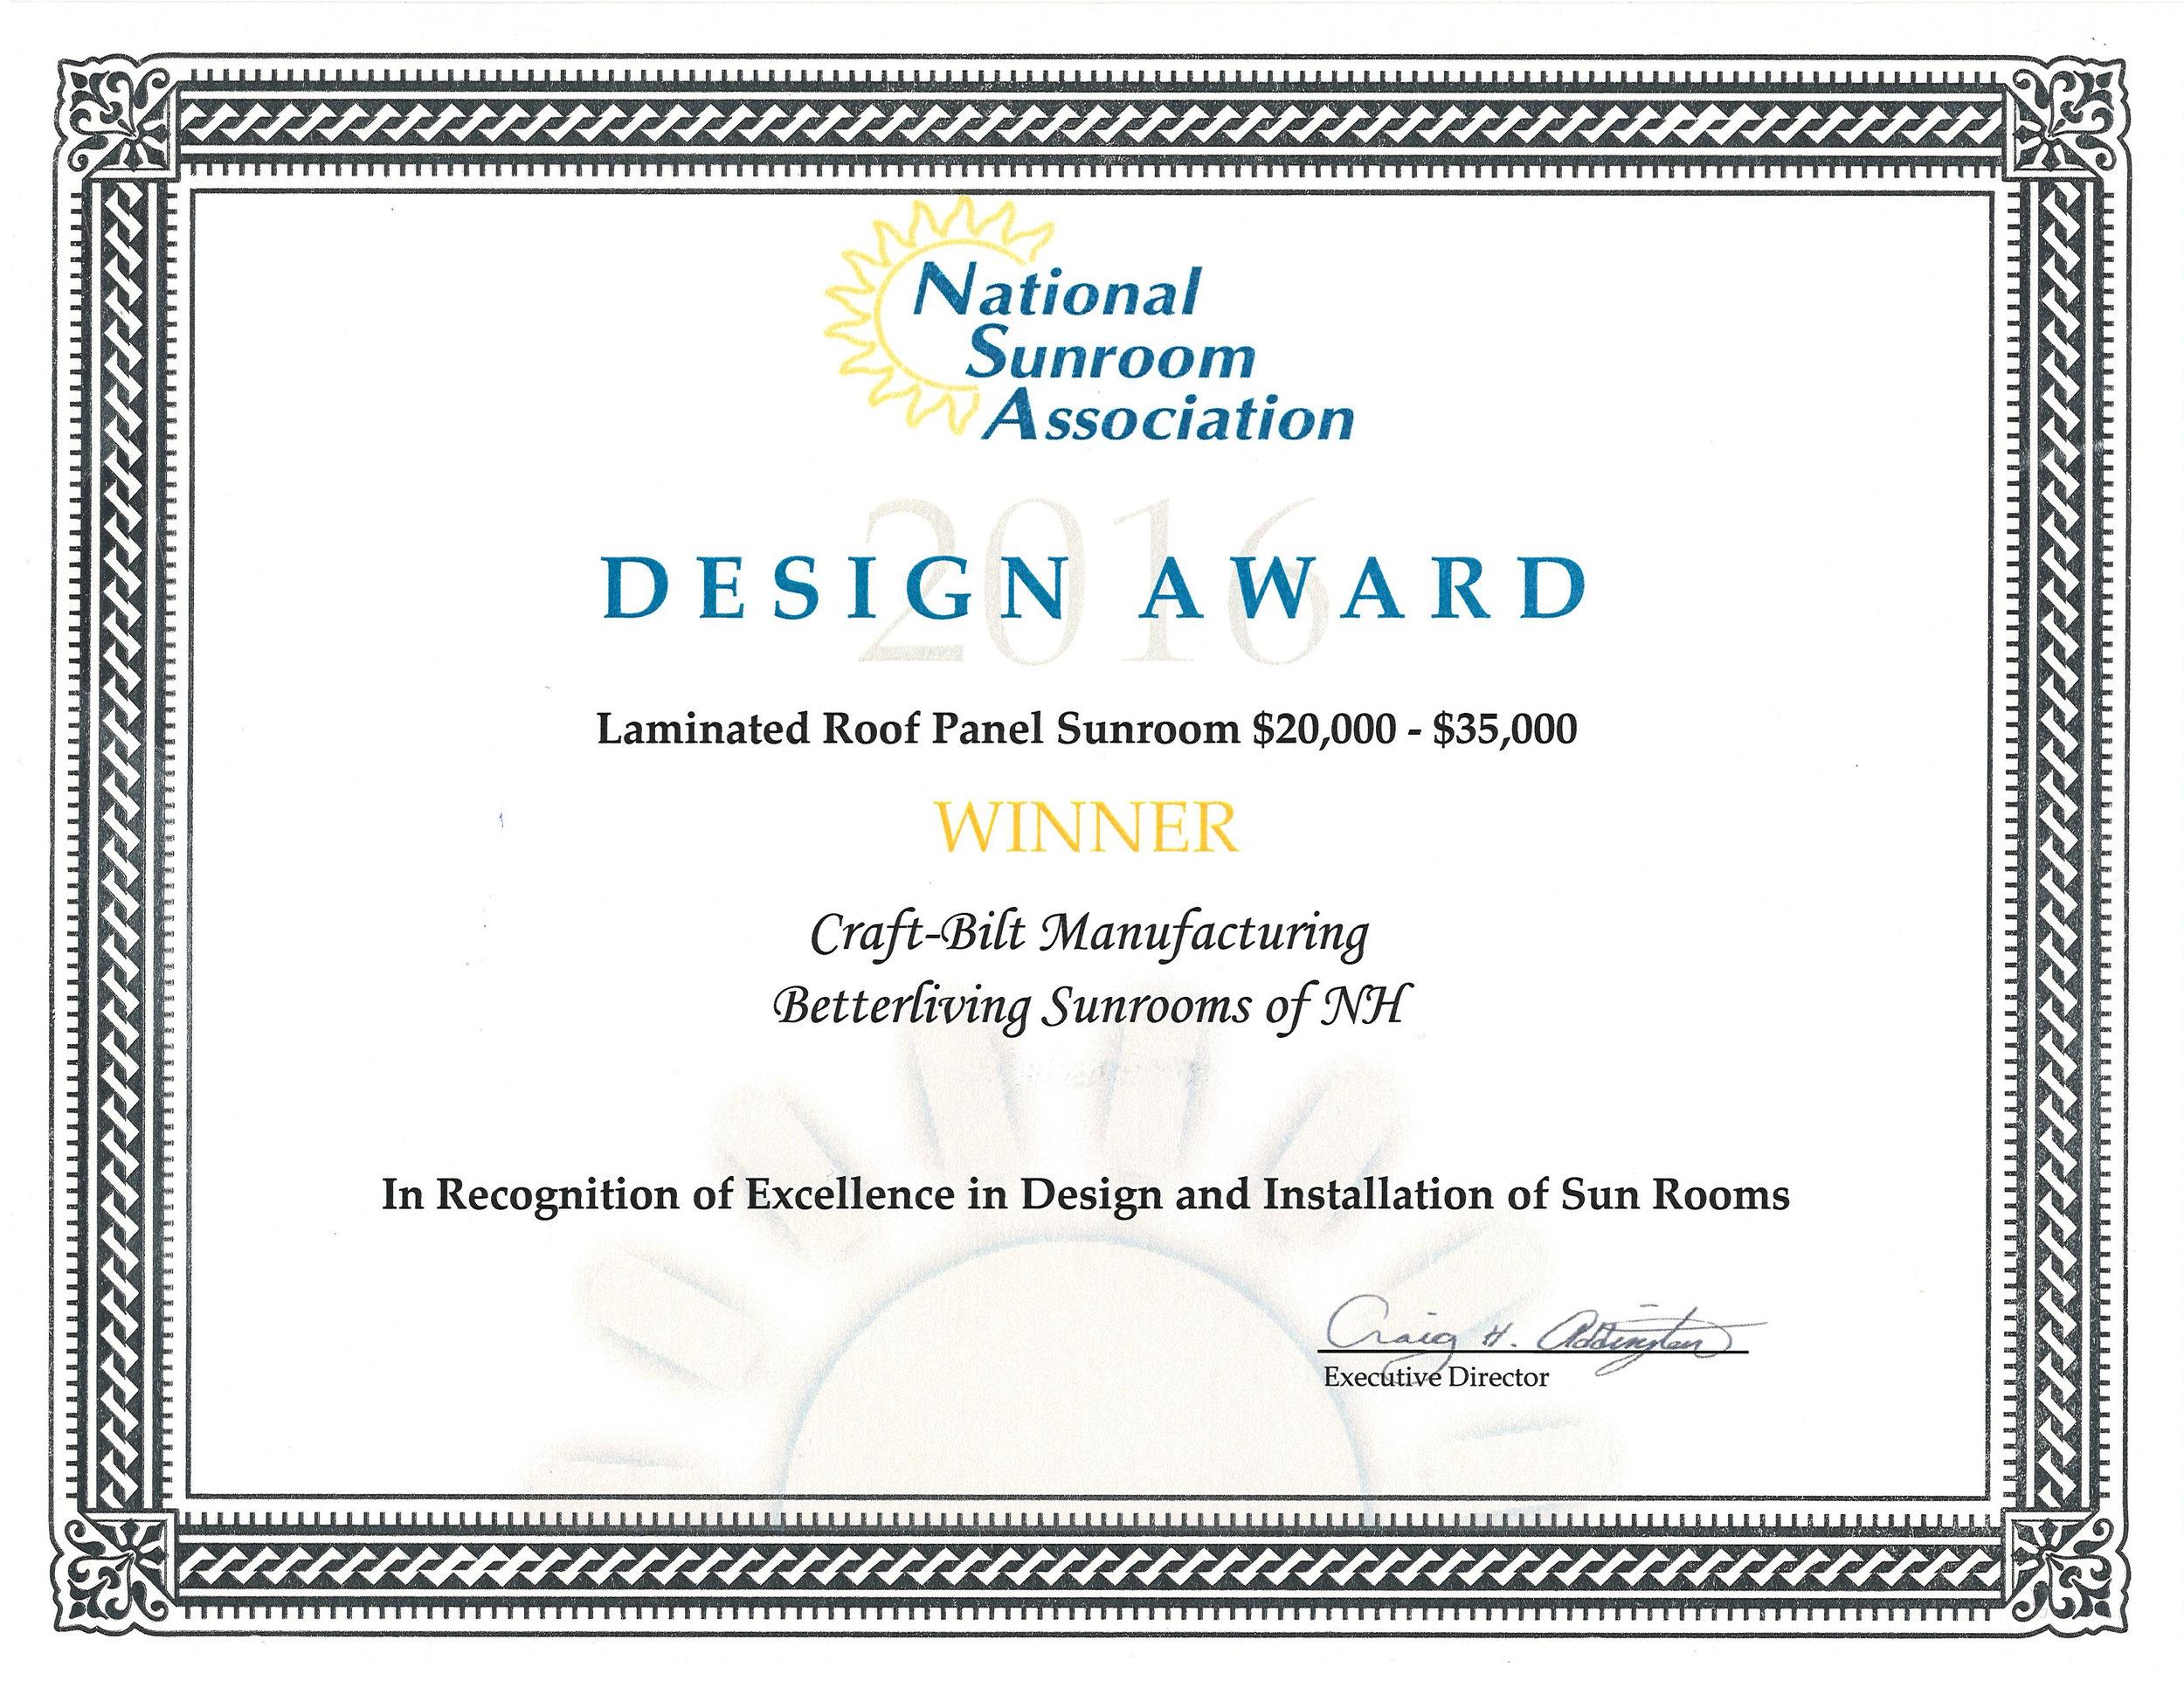 Sunroom Design Award - Betterliving Sunrooms of New Hampshire